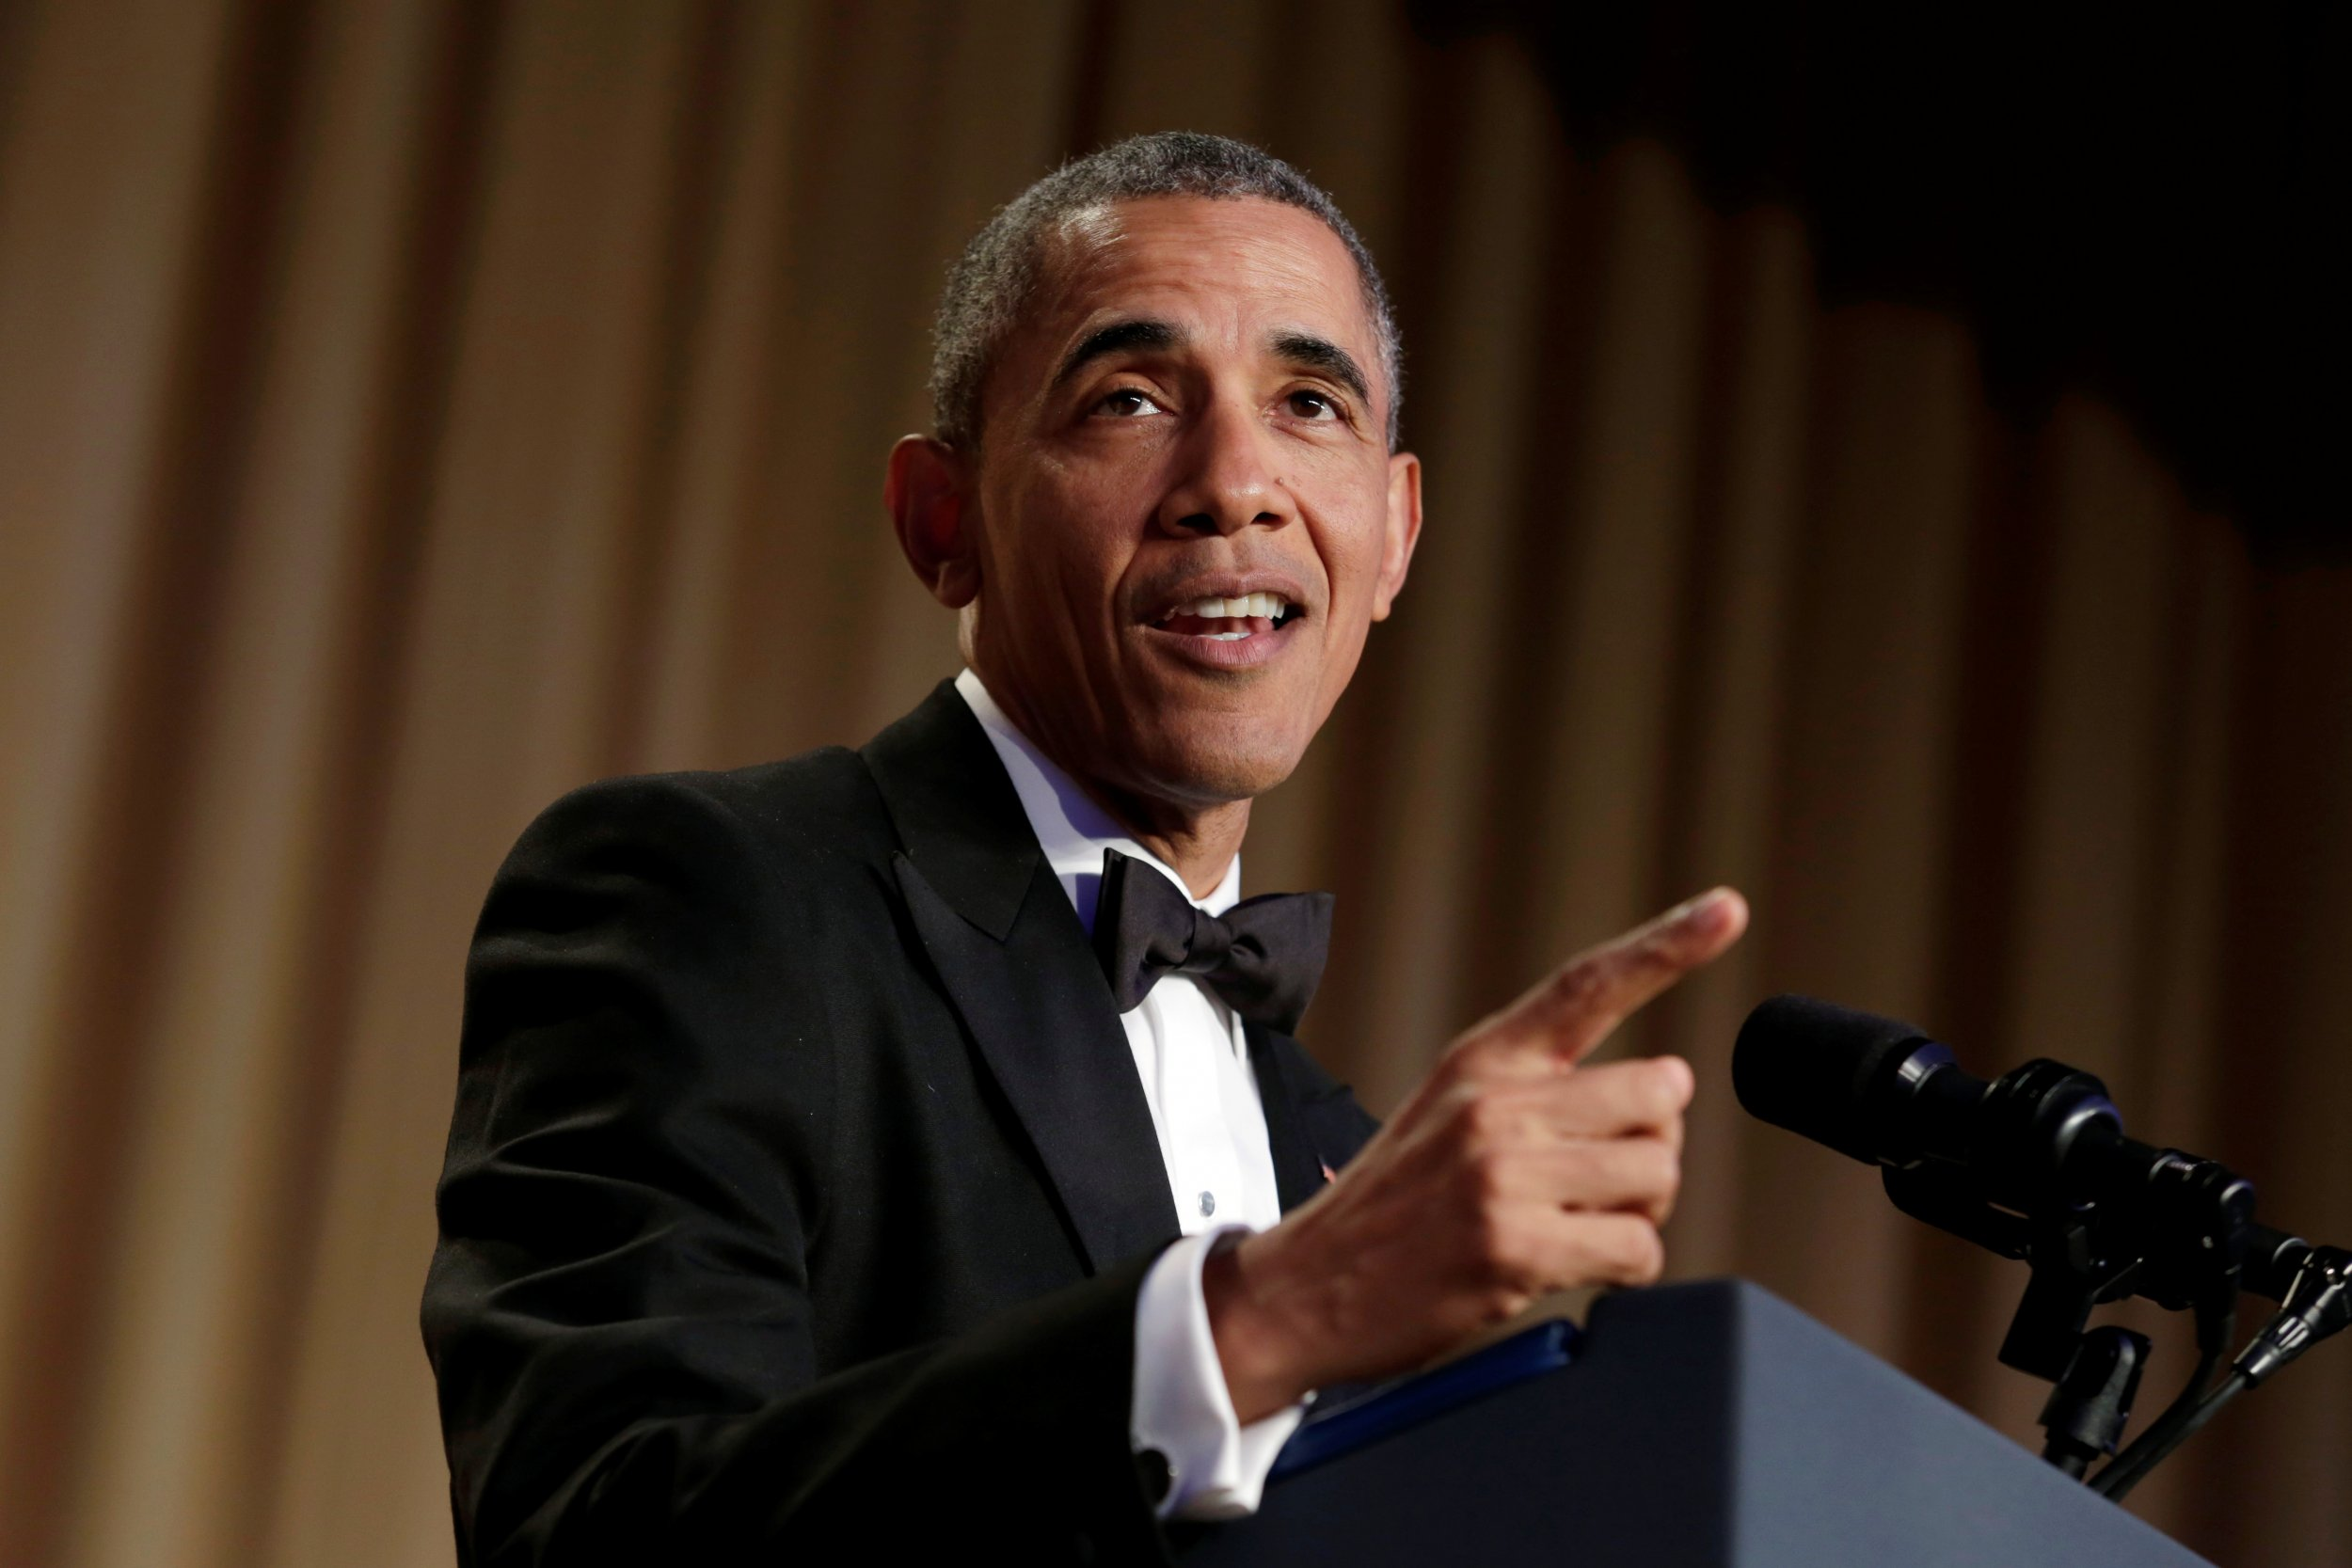 0516_President_Obama_Facebook_Live_BuzzFeed_01